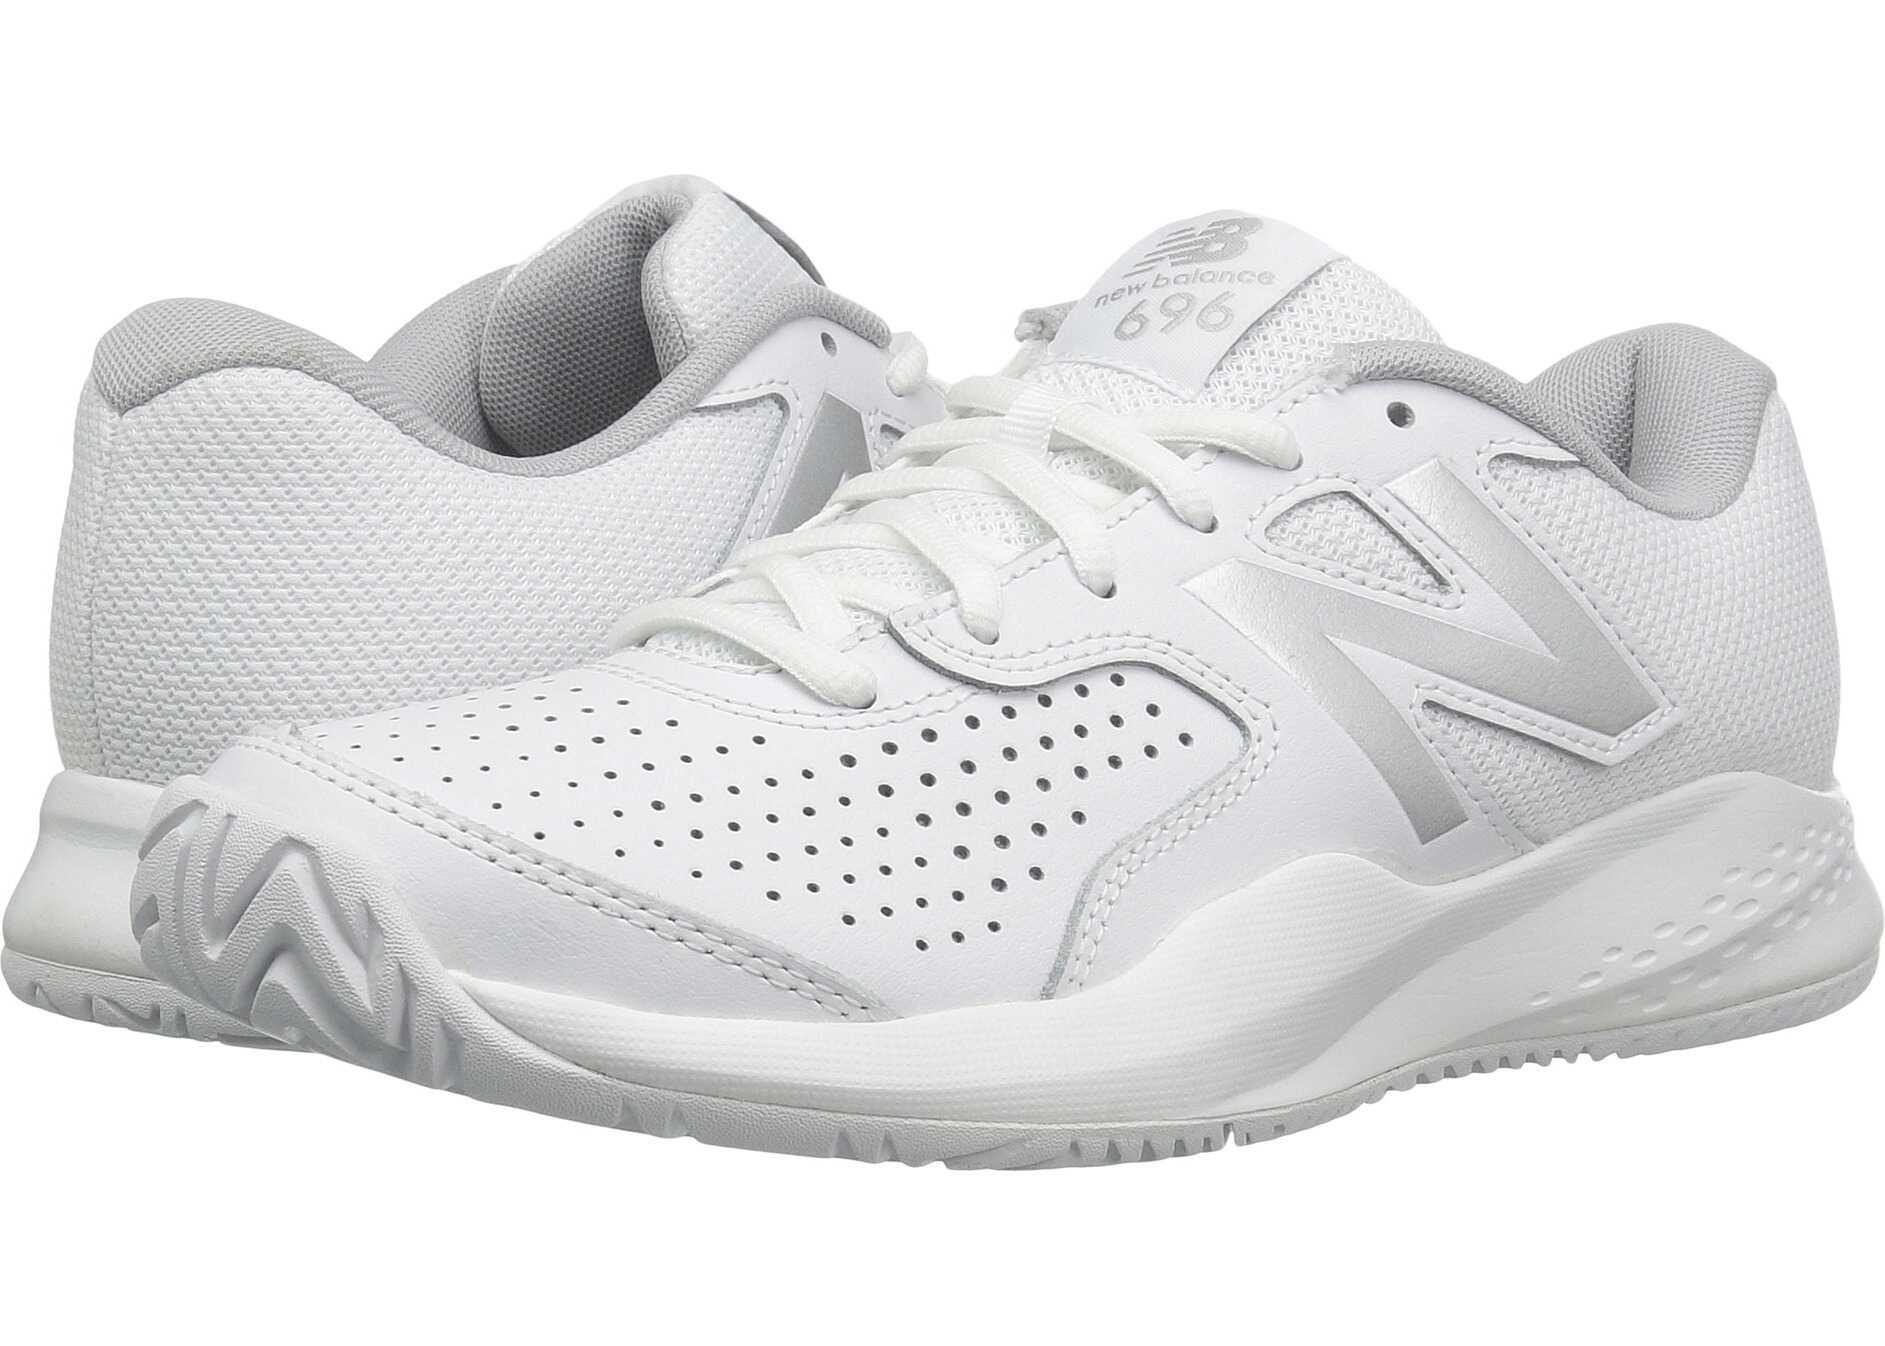 New Balance WC696v3 White/Silver